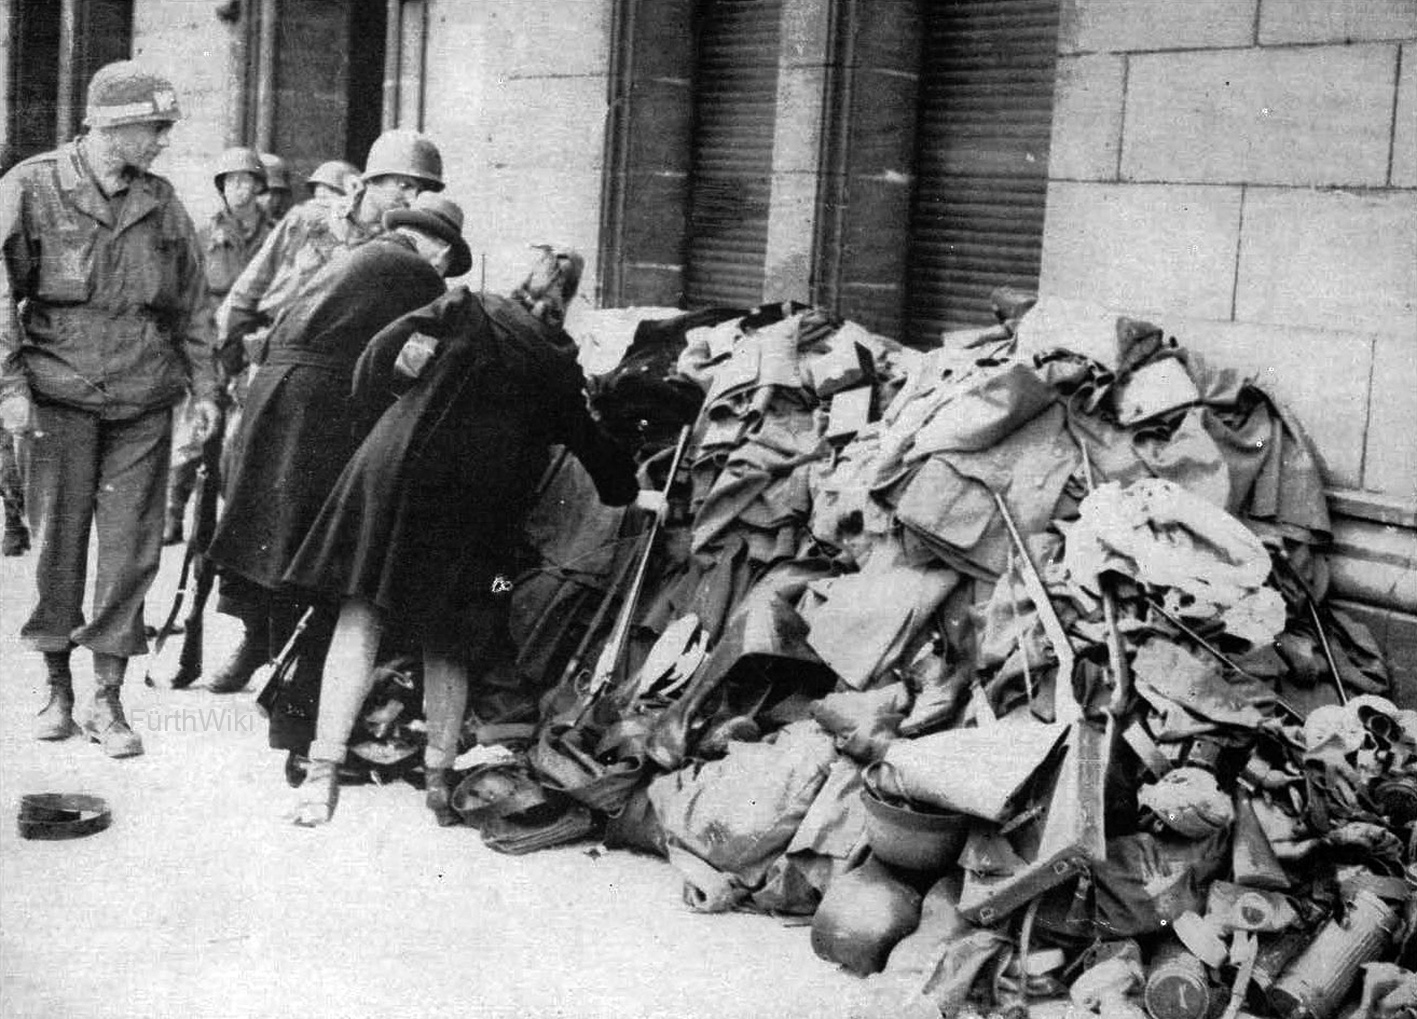 http://www.fuerthwiki.de/wiki/images/b/b2/Waffenabgabe_Rathaus_1945.jpg